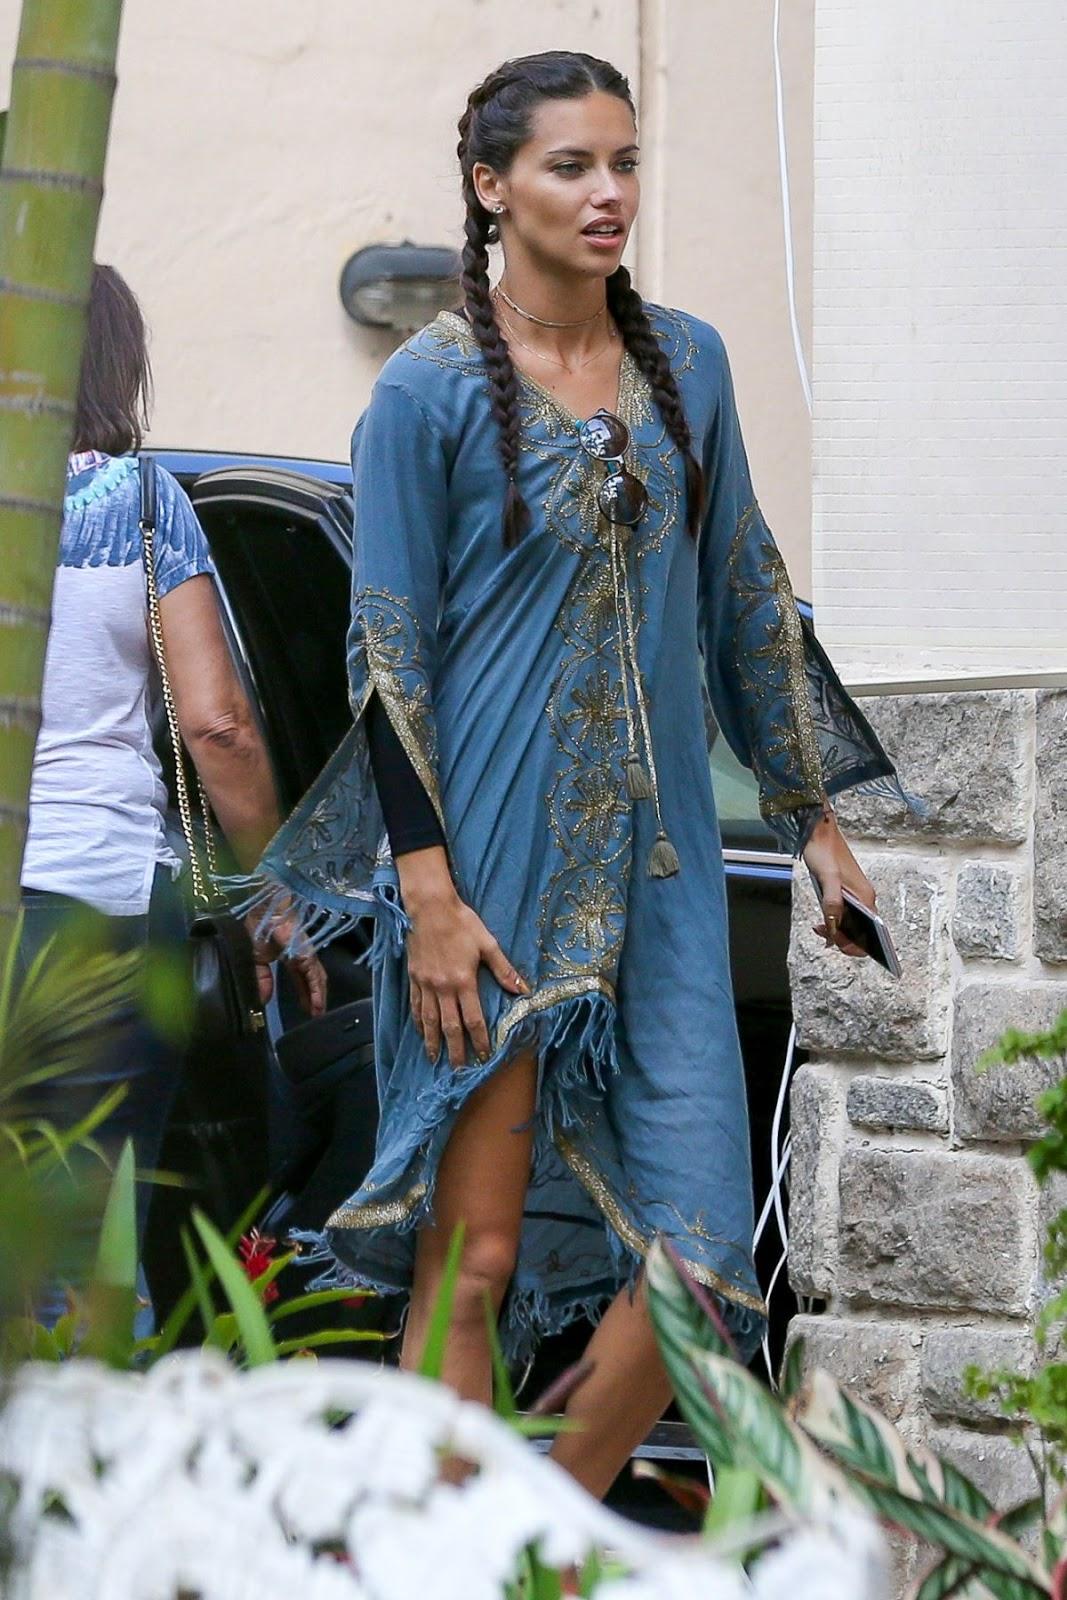 Victoria's Secret Fashion Show Model Adriana Lima out in Rio De Janeiro-HD Photos